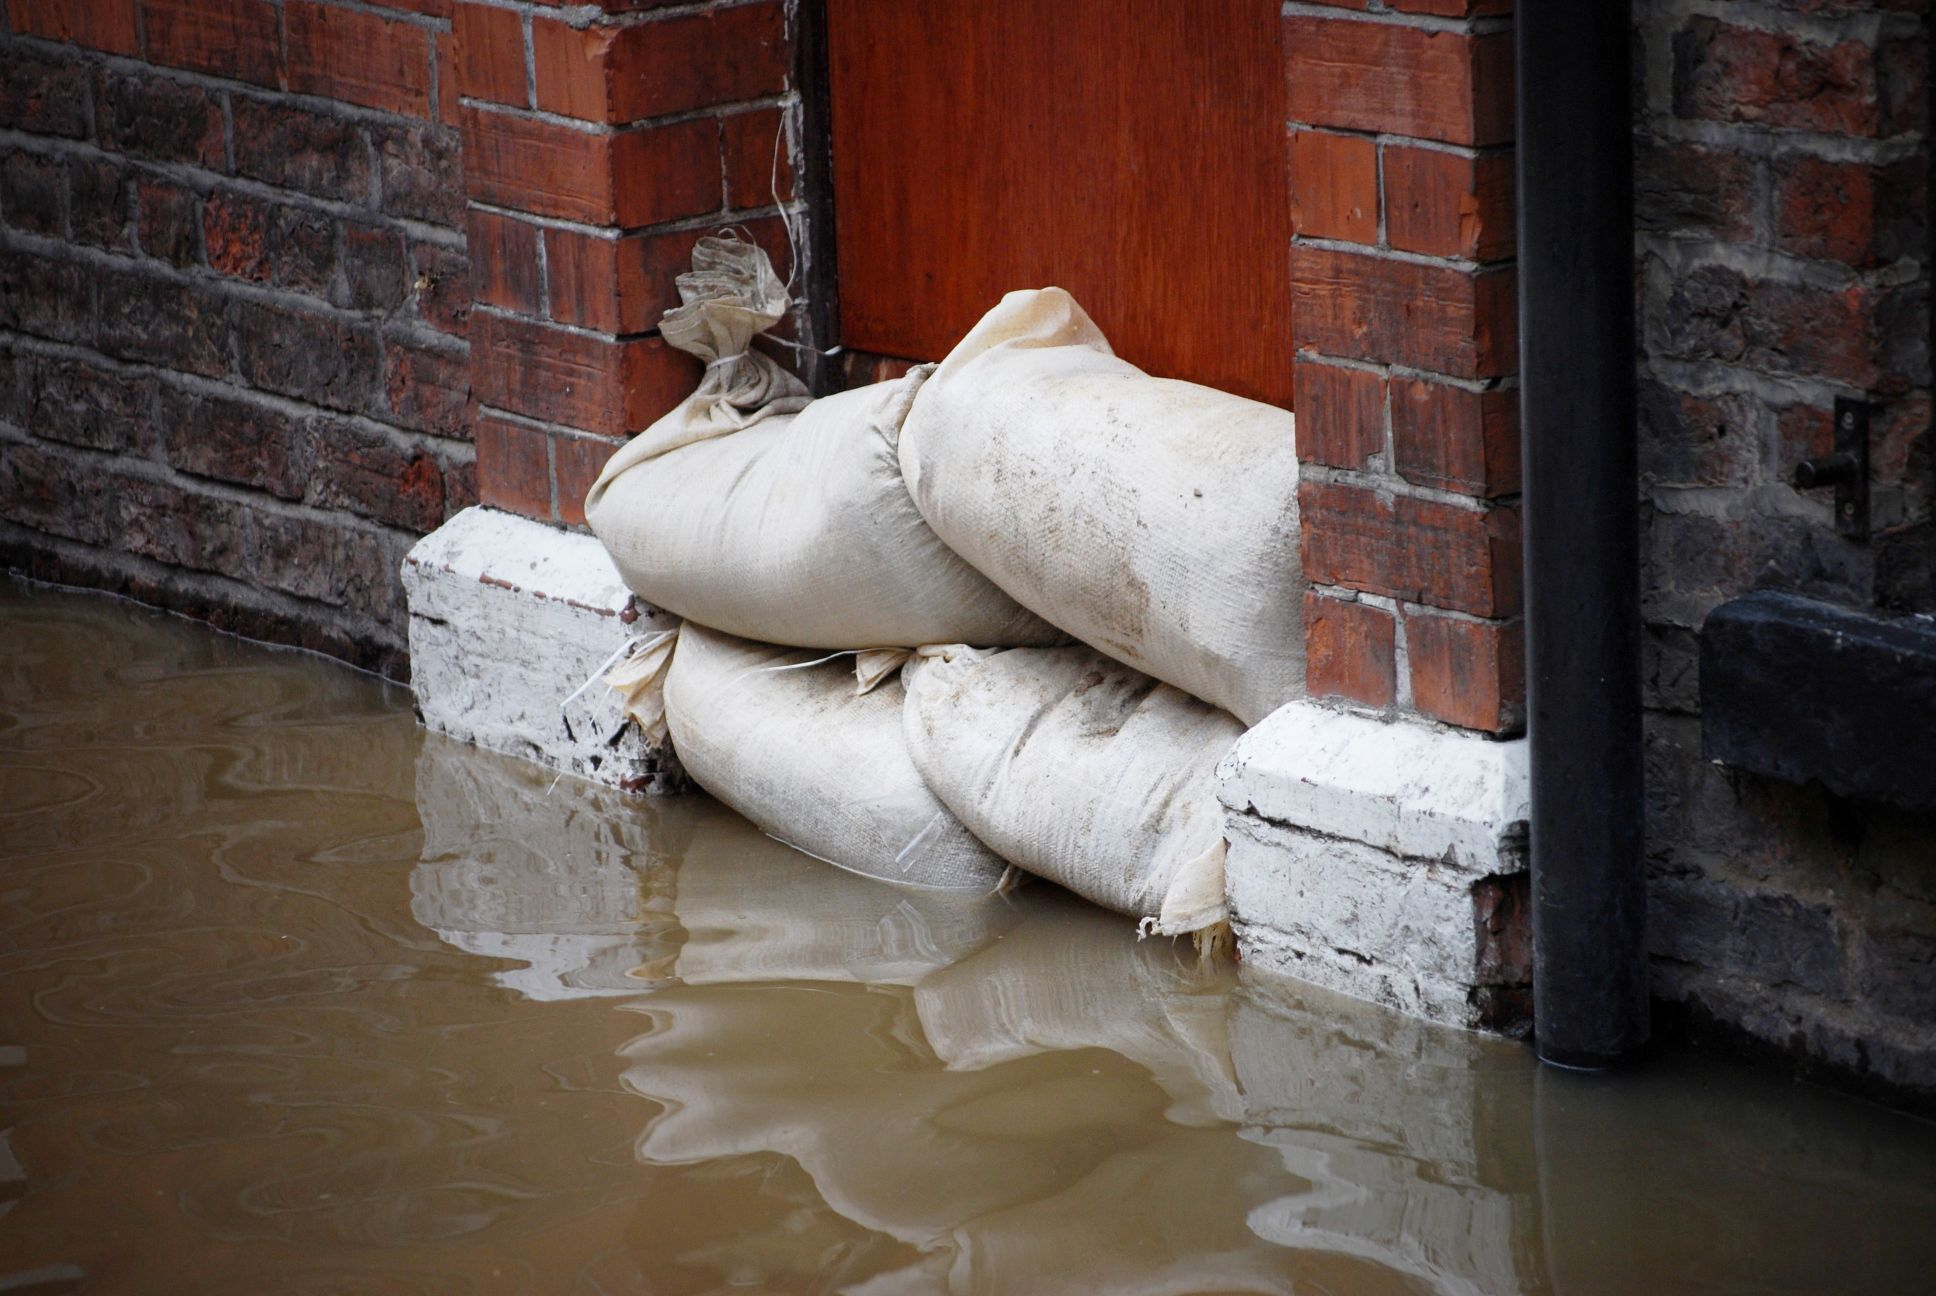 Fire & Flood Emergency Service